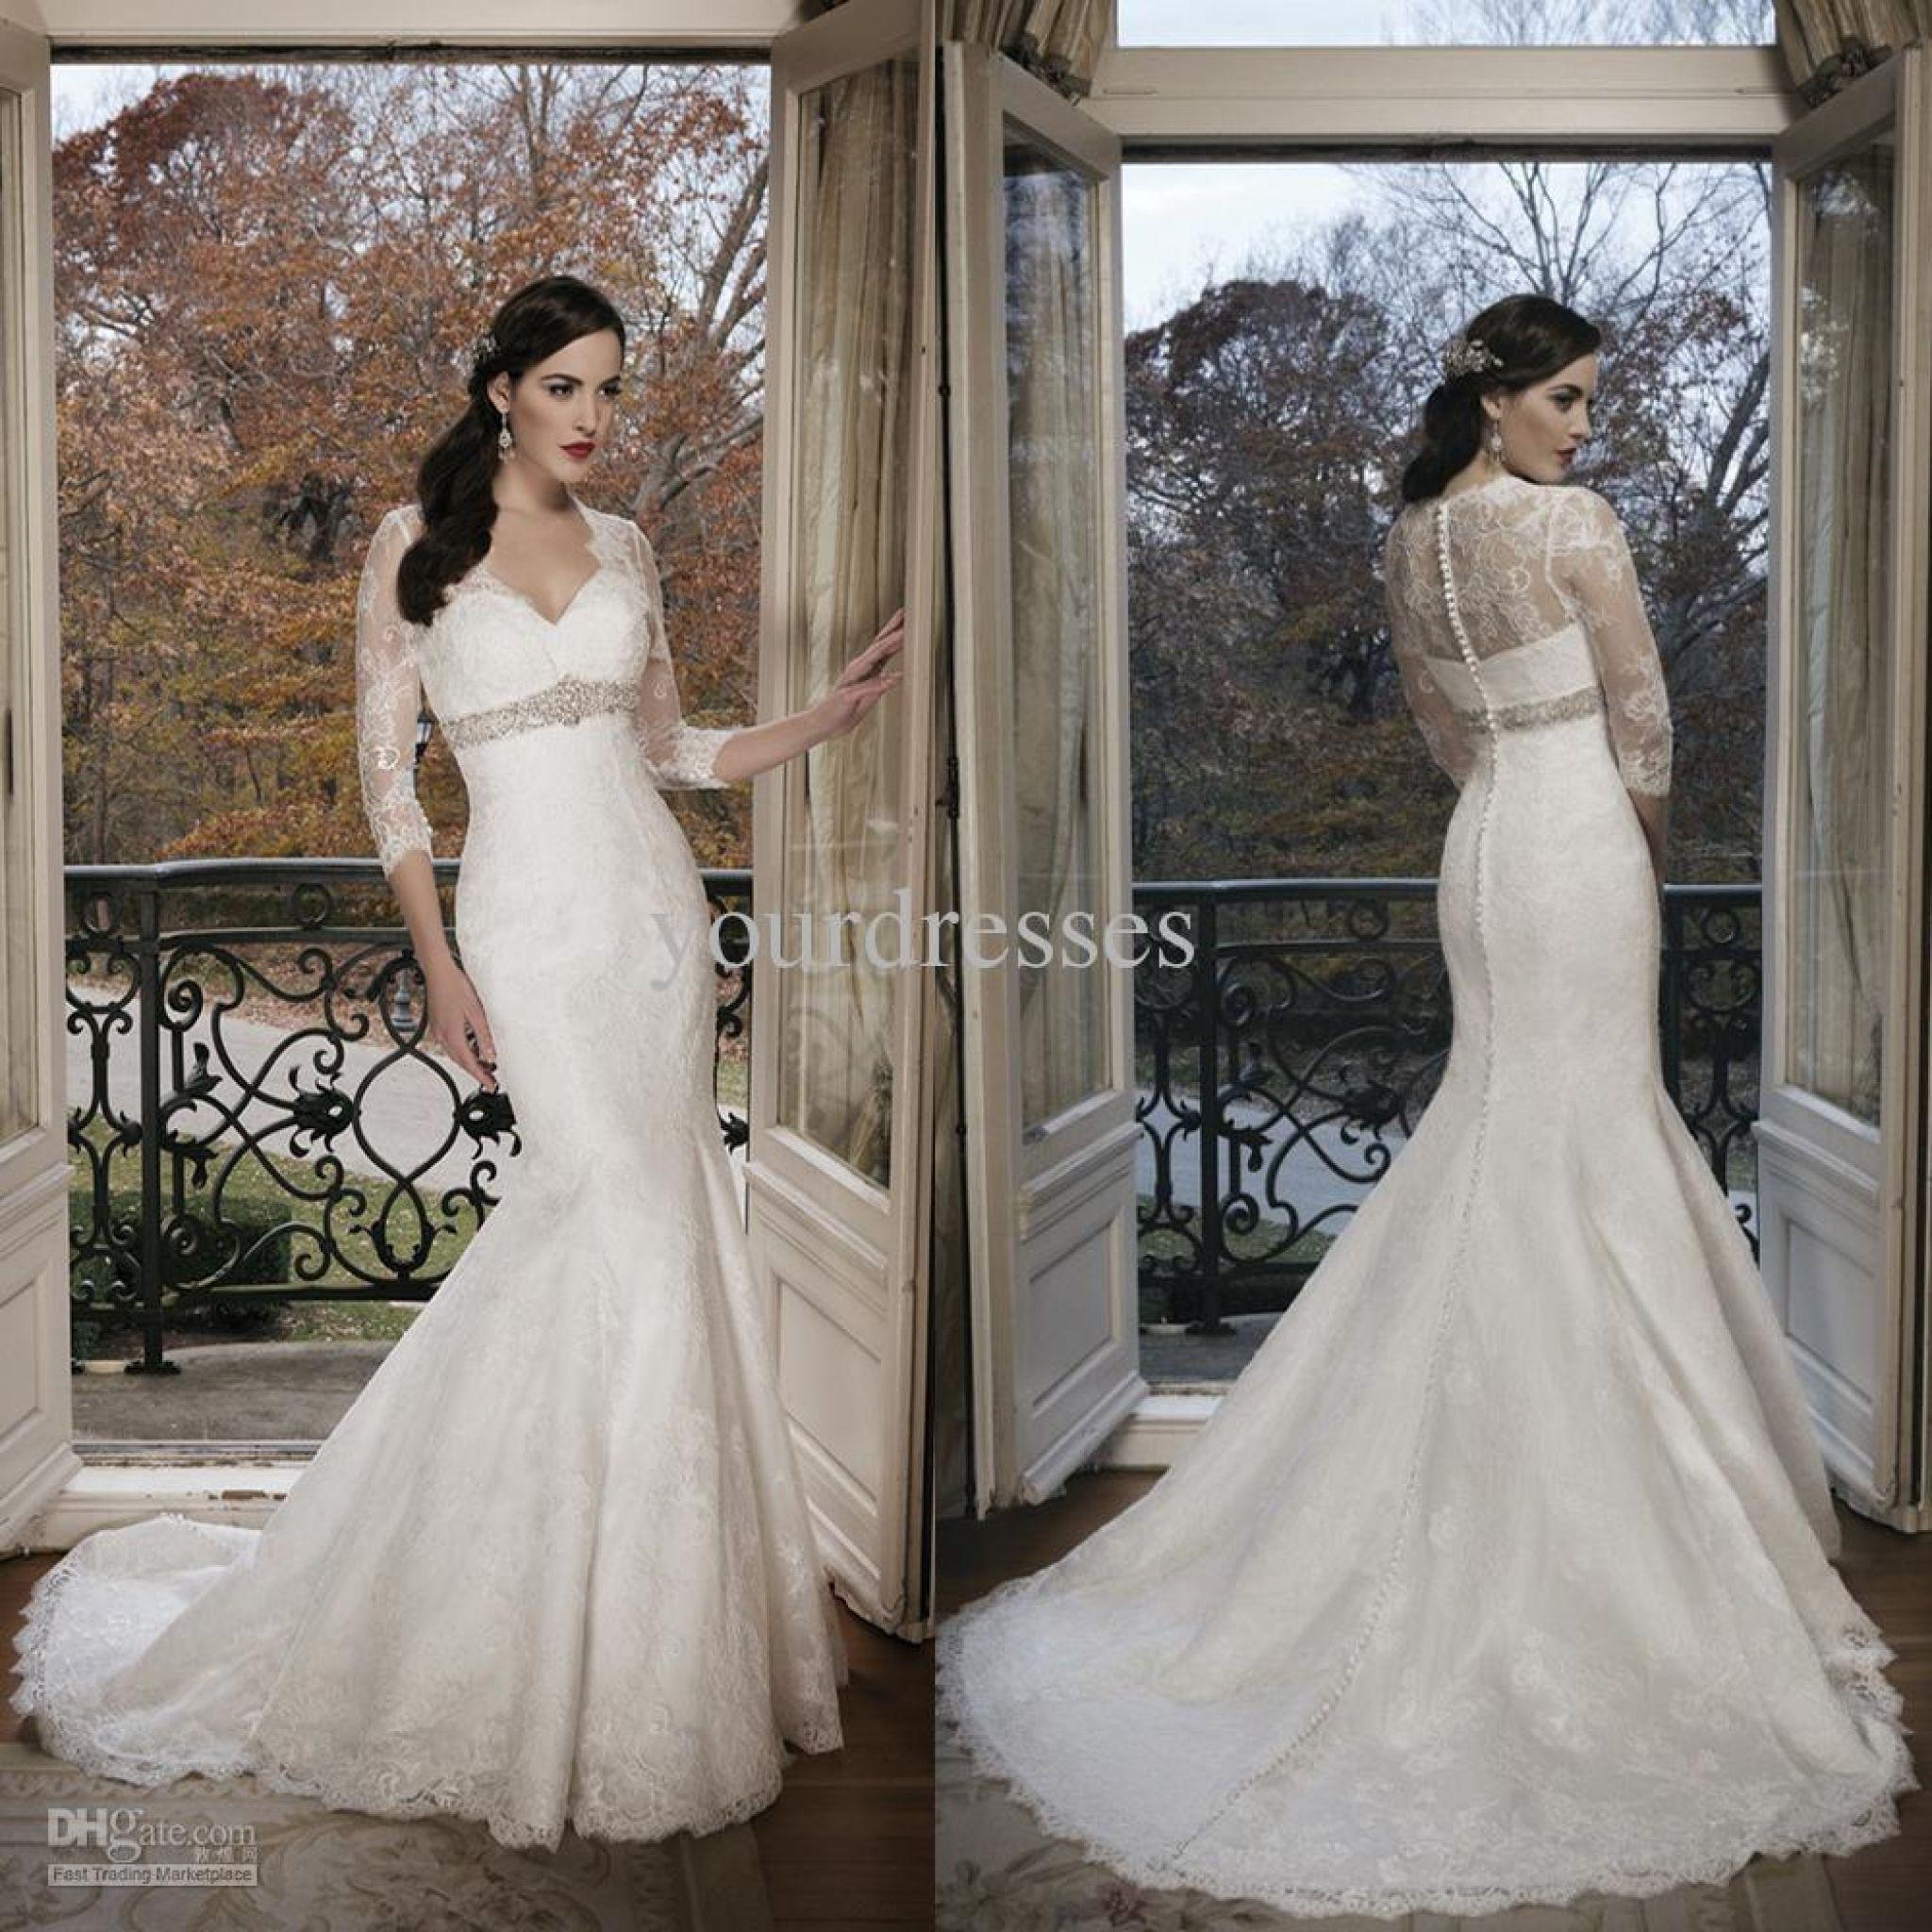 Corset style wedding dresses dresses for wedding reception check